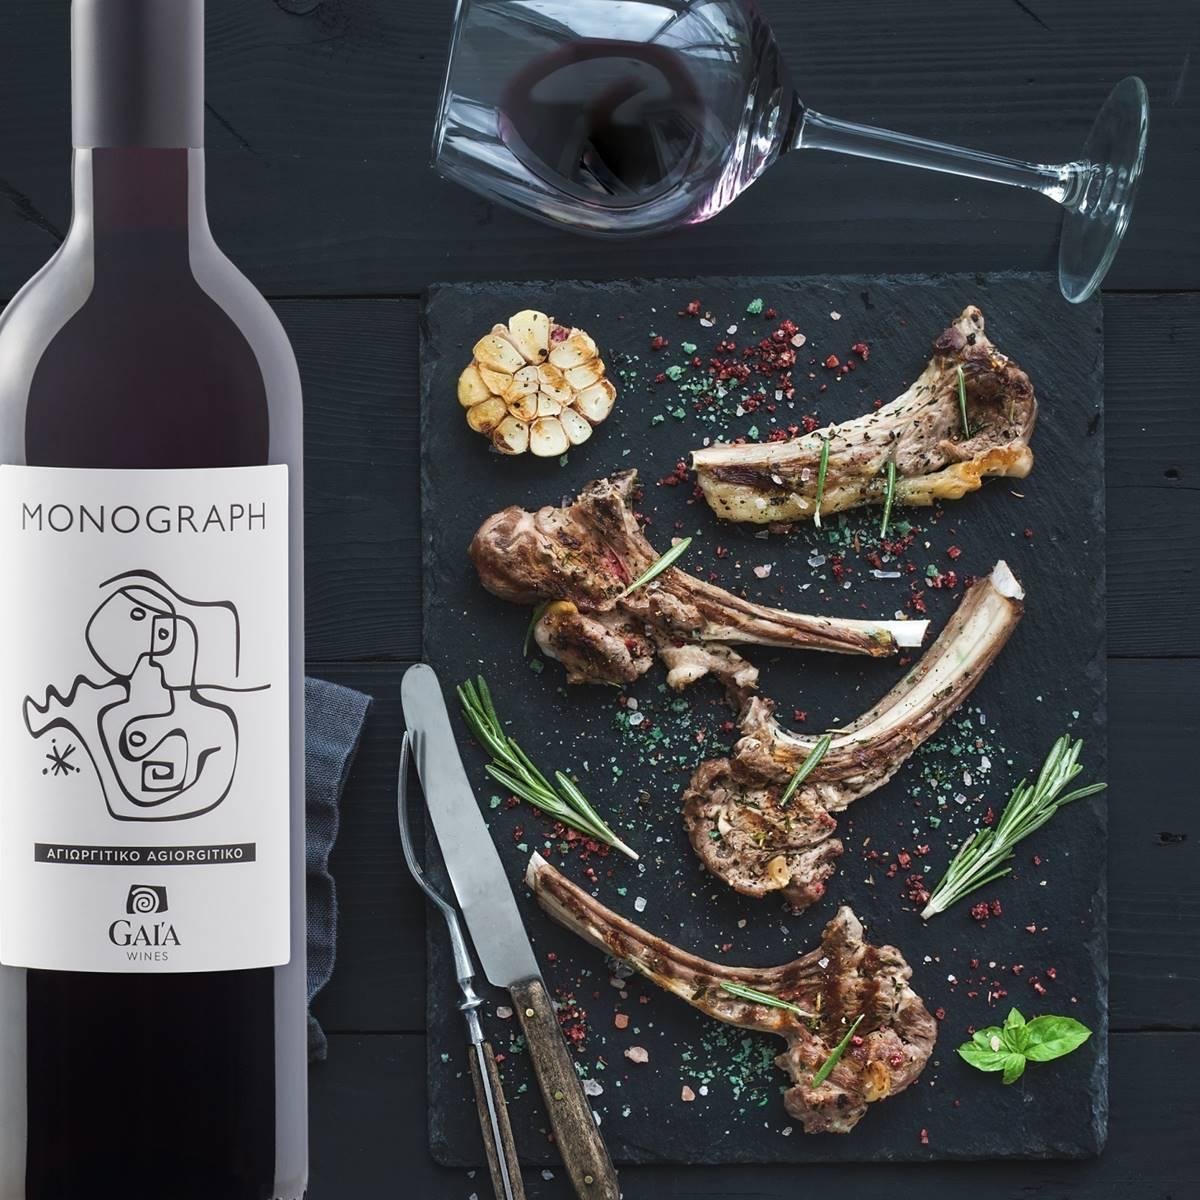 Wine Pairing Monograph Αγιωργίτικο, Κόκκινο - Gaia Wines